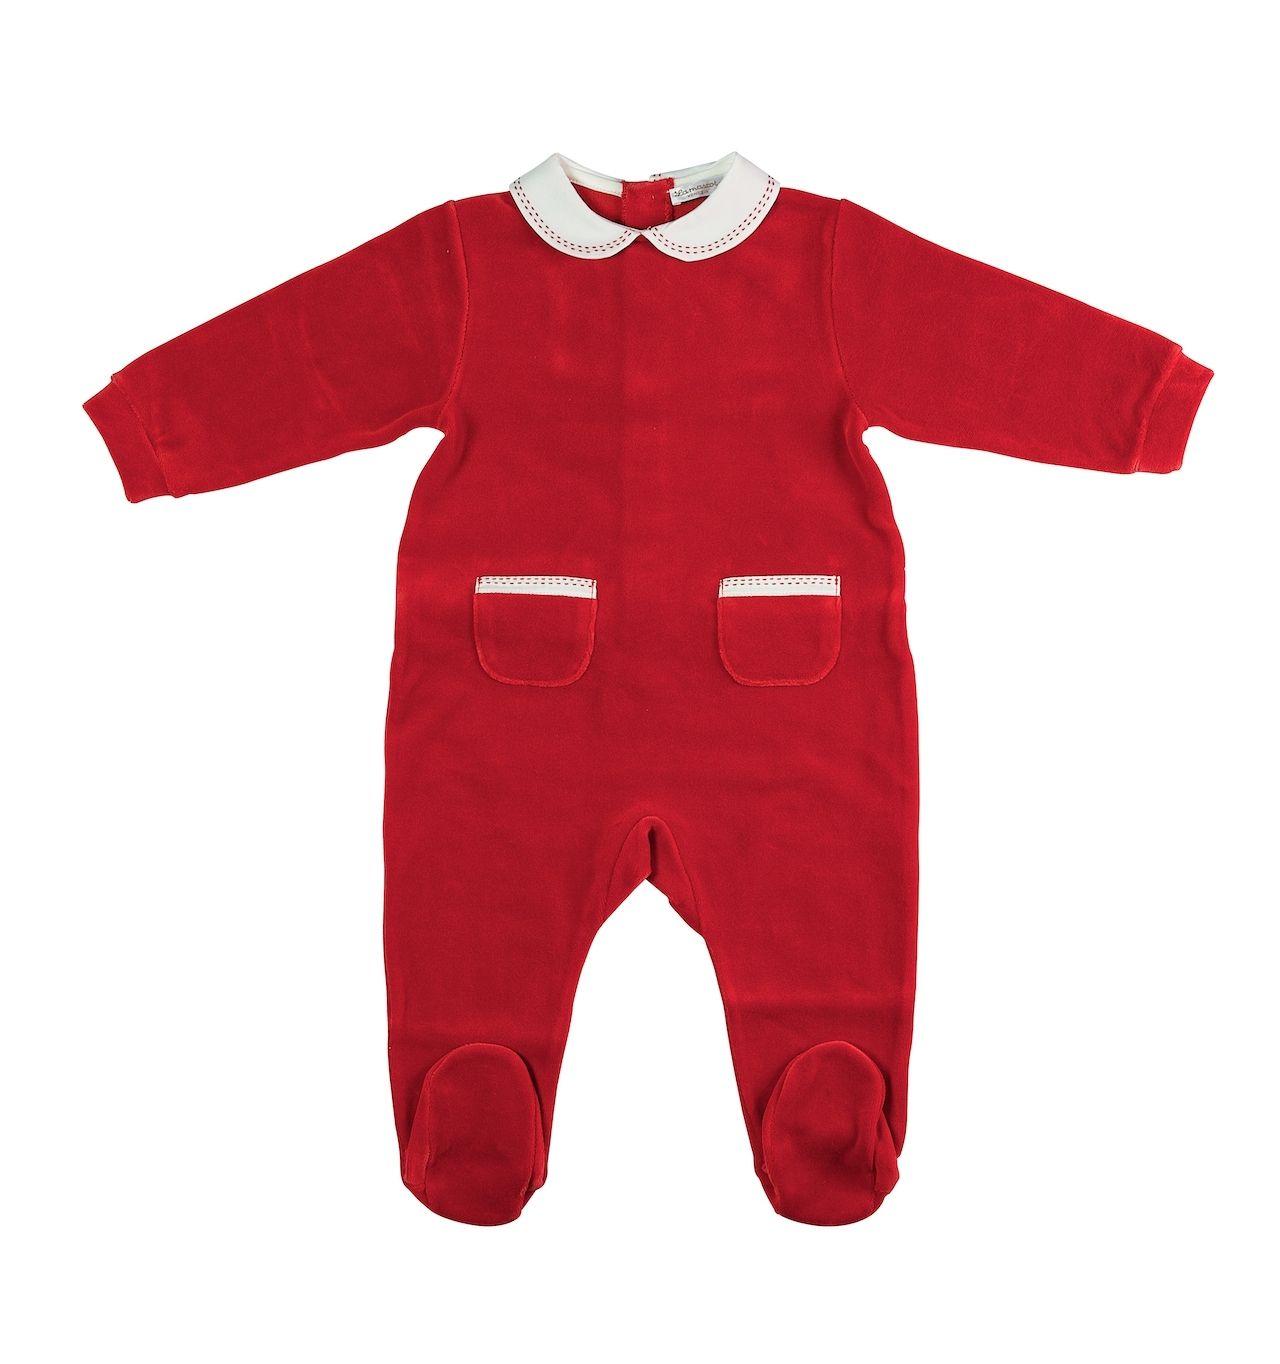 www.mamibu.com #Lamascot #madeinitaly #Babygrow #tutina in #ciniglia #neonato e #neonata. #Natale #Christmas